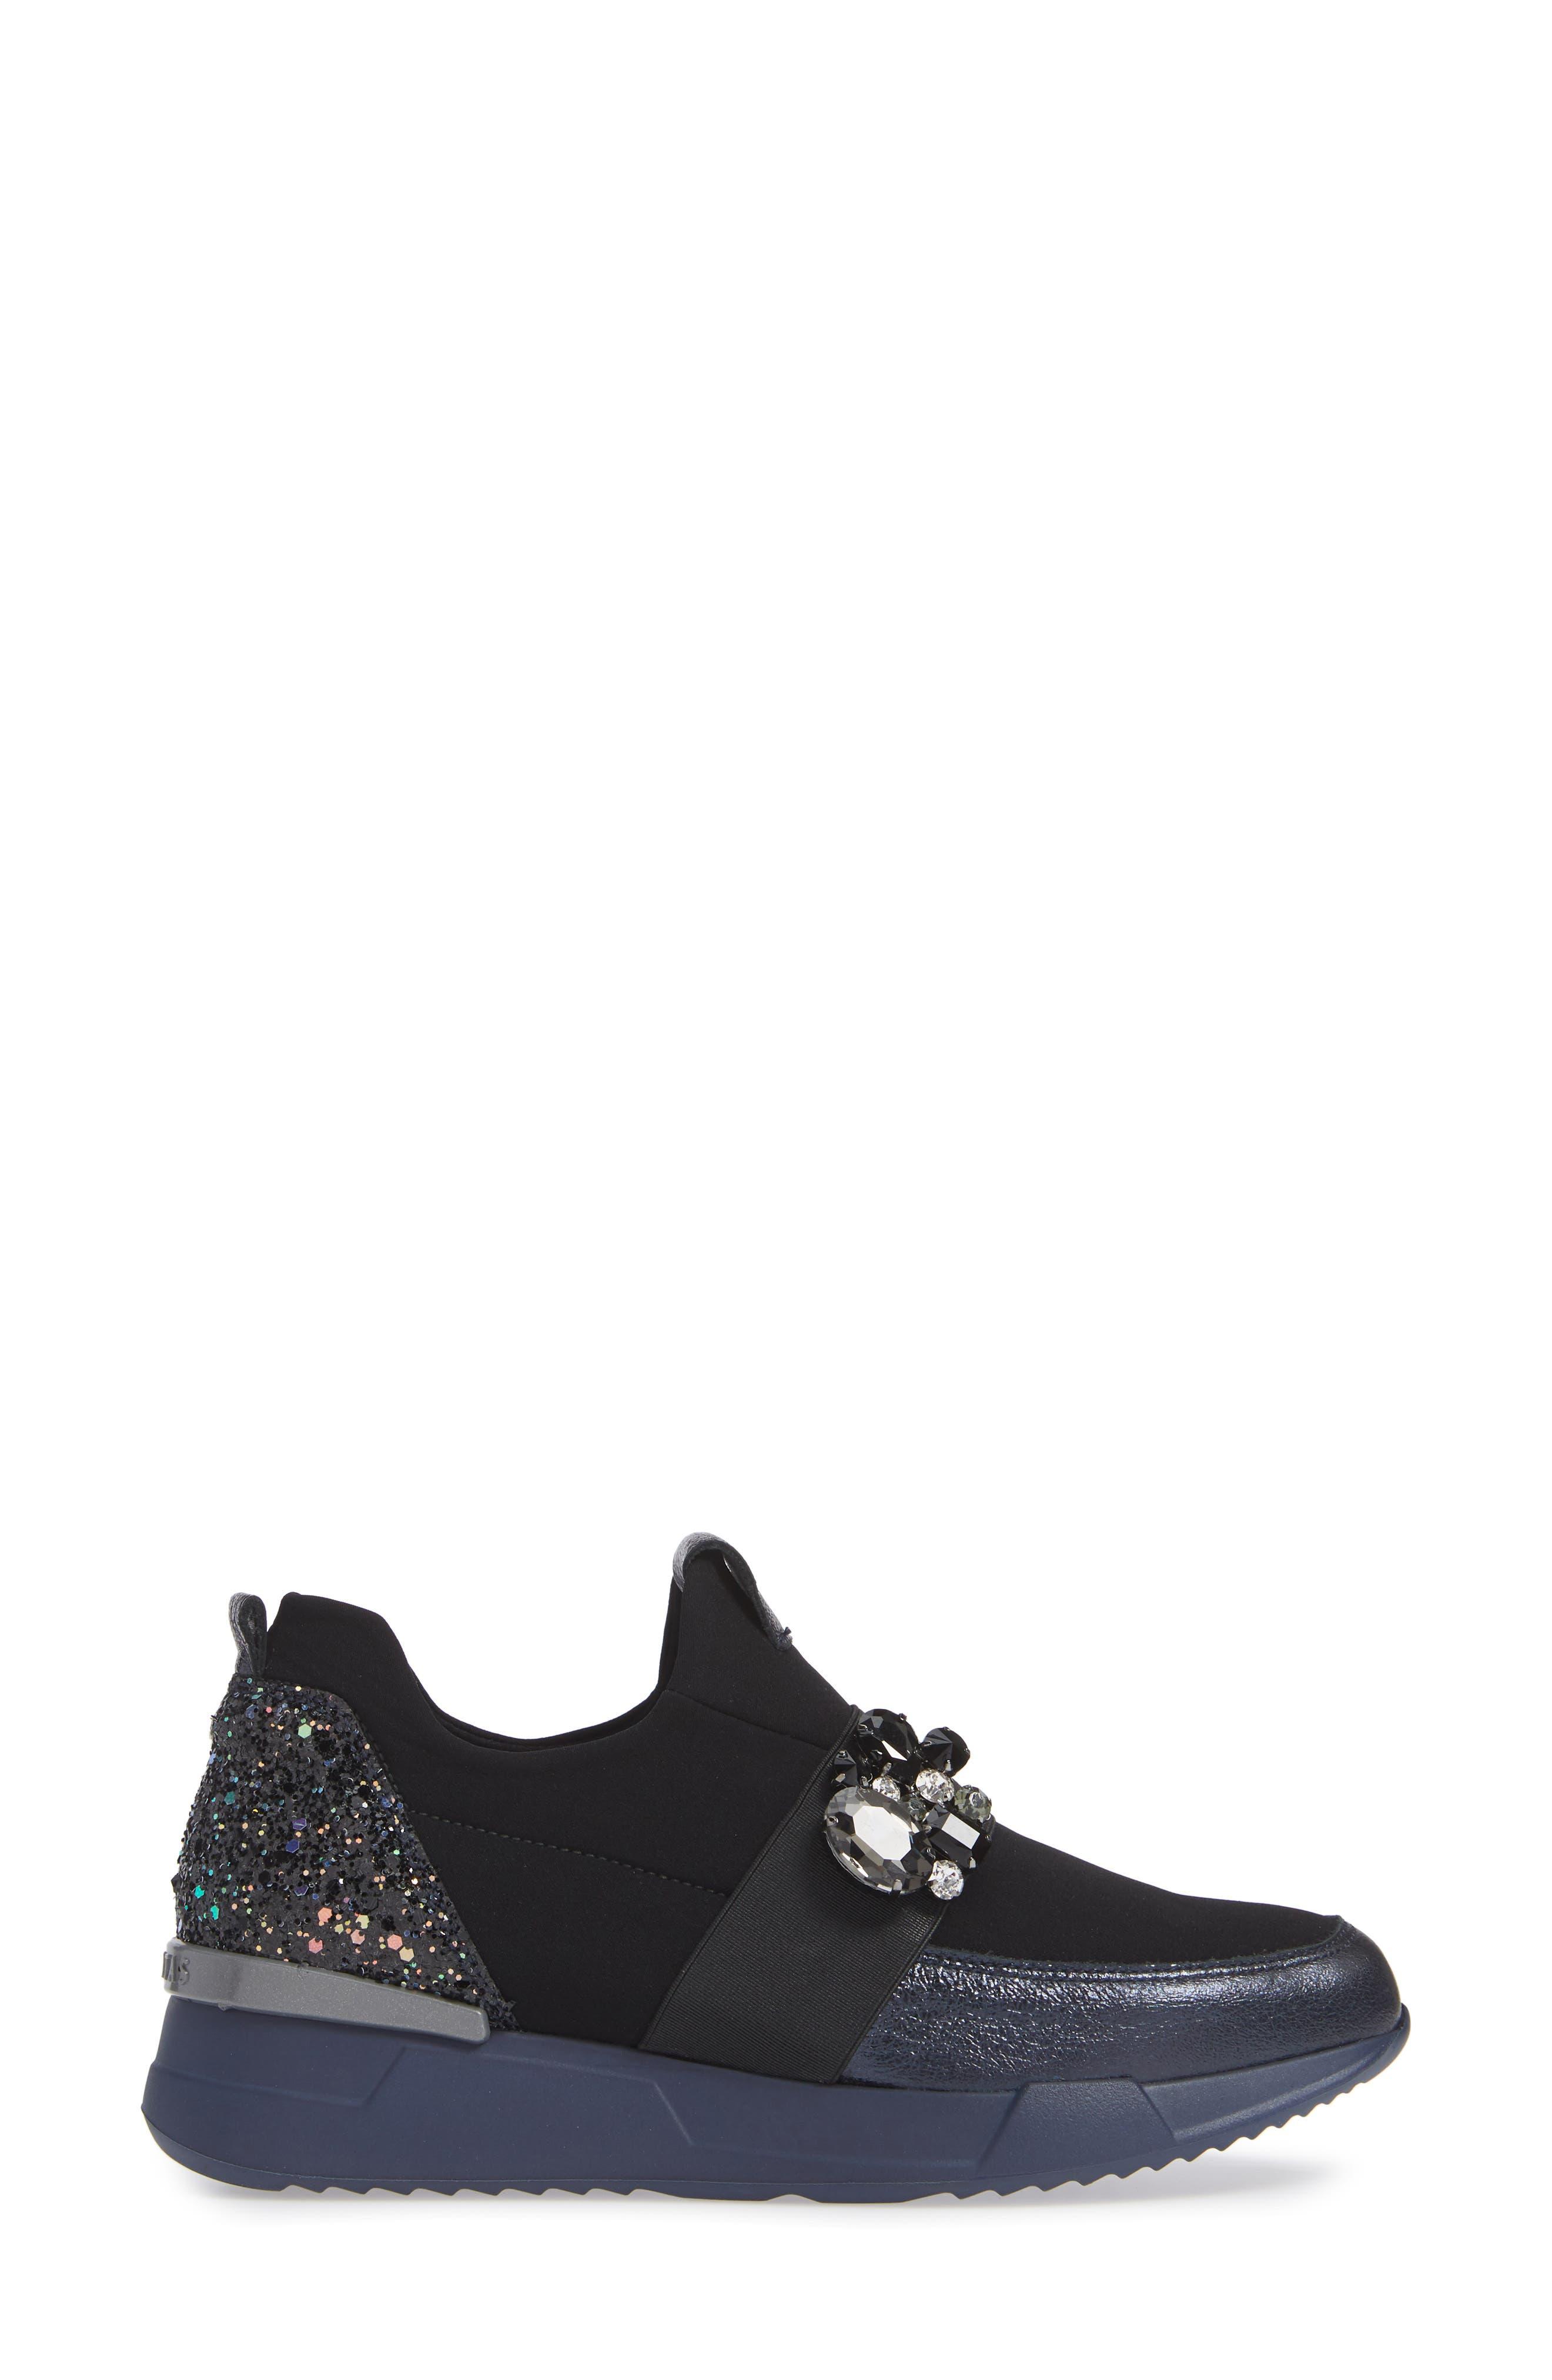 Callen Embellished Sock Sneaker,                             Alternate thumbnail 3, color,                             SHADOW MARINE LEATHER